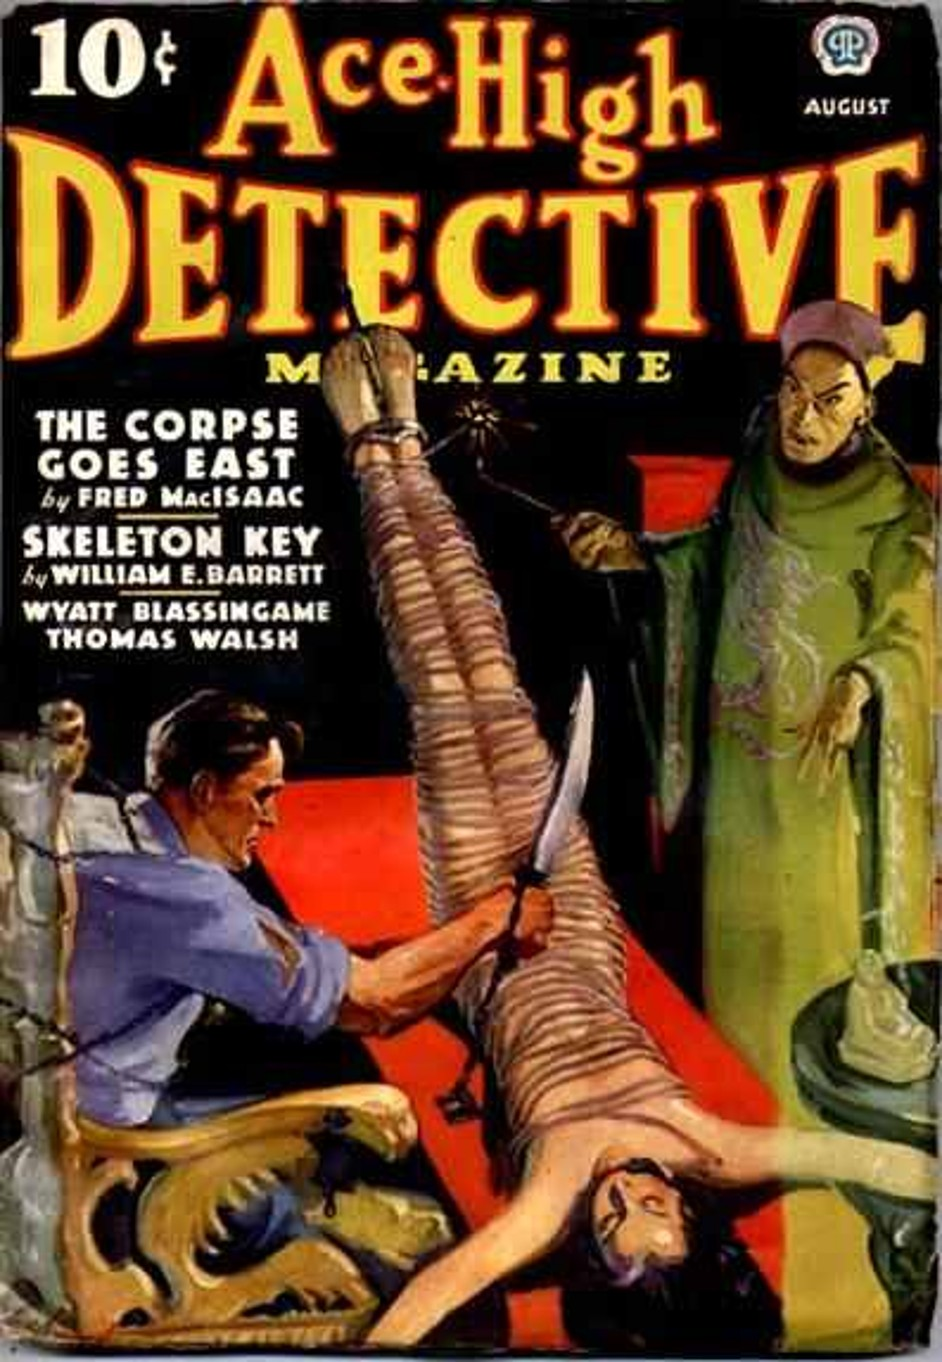 ace_high_detective_193608_v1_n1.jpg